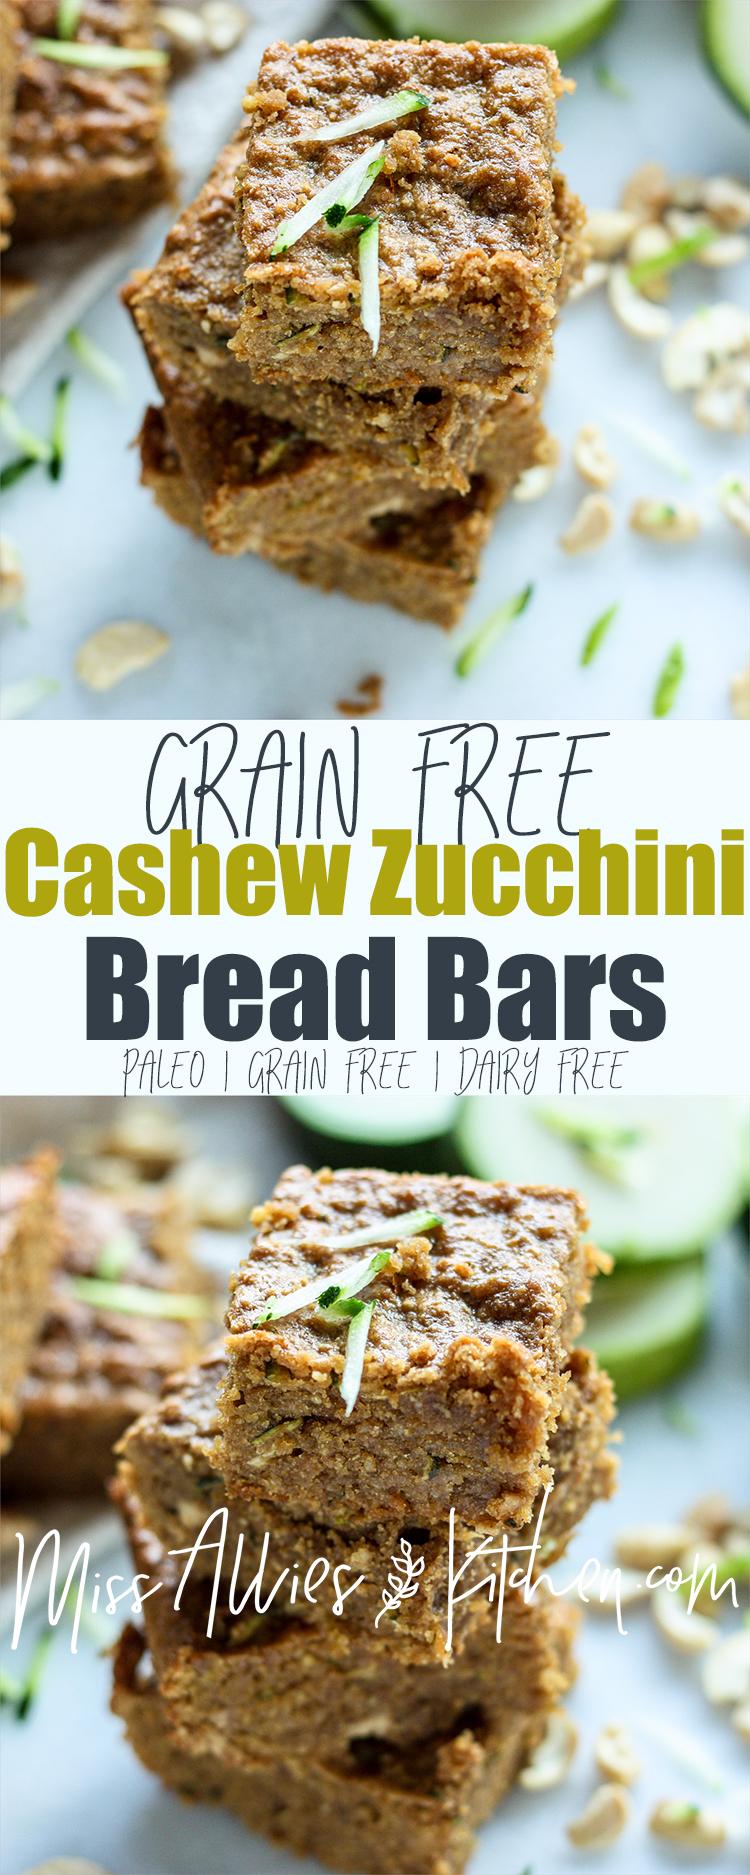 Grain Free Cashew Zucchini Bars - Paleo & Gluten Free